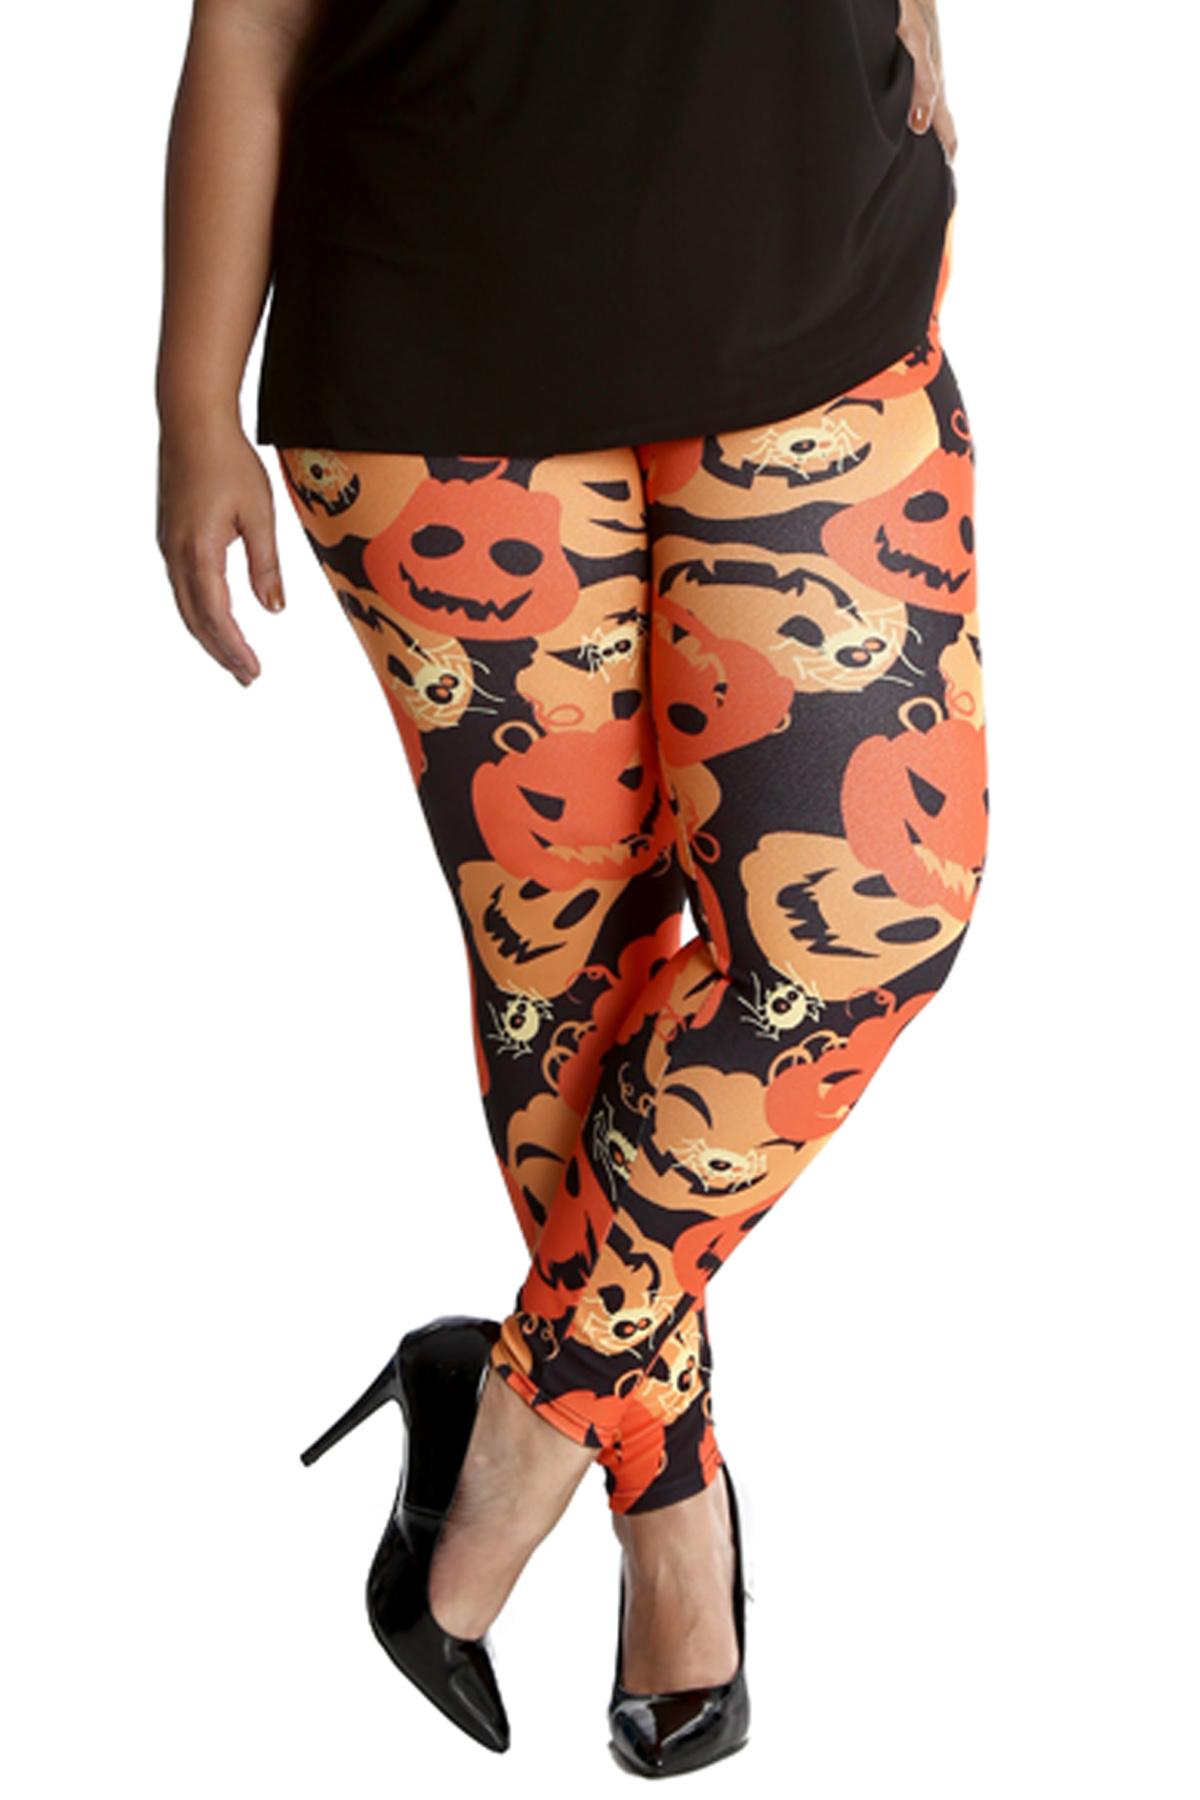 cfcbc1b0814d6 New Ladies Plus Size Leggings Womens Halloween Spooky Spider Pumpkin ...